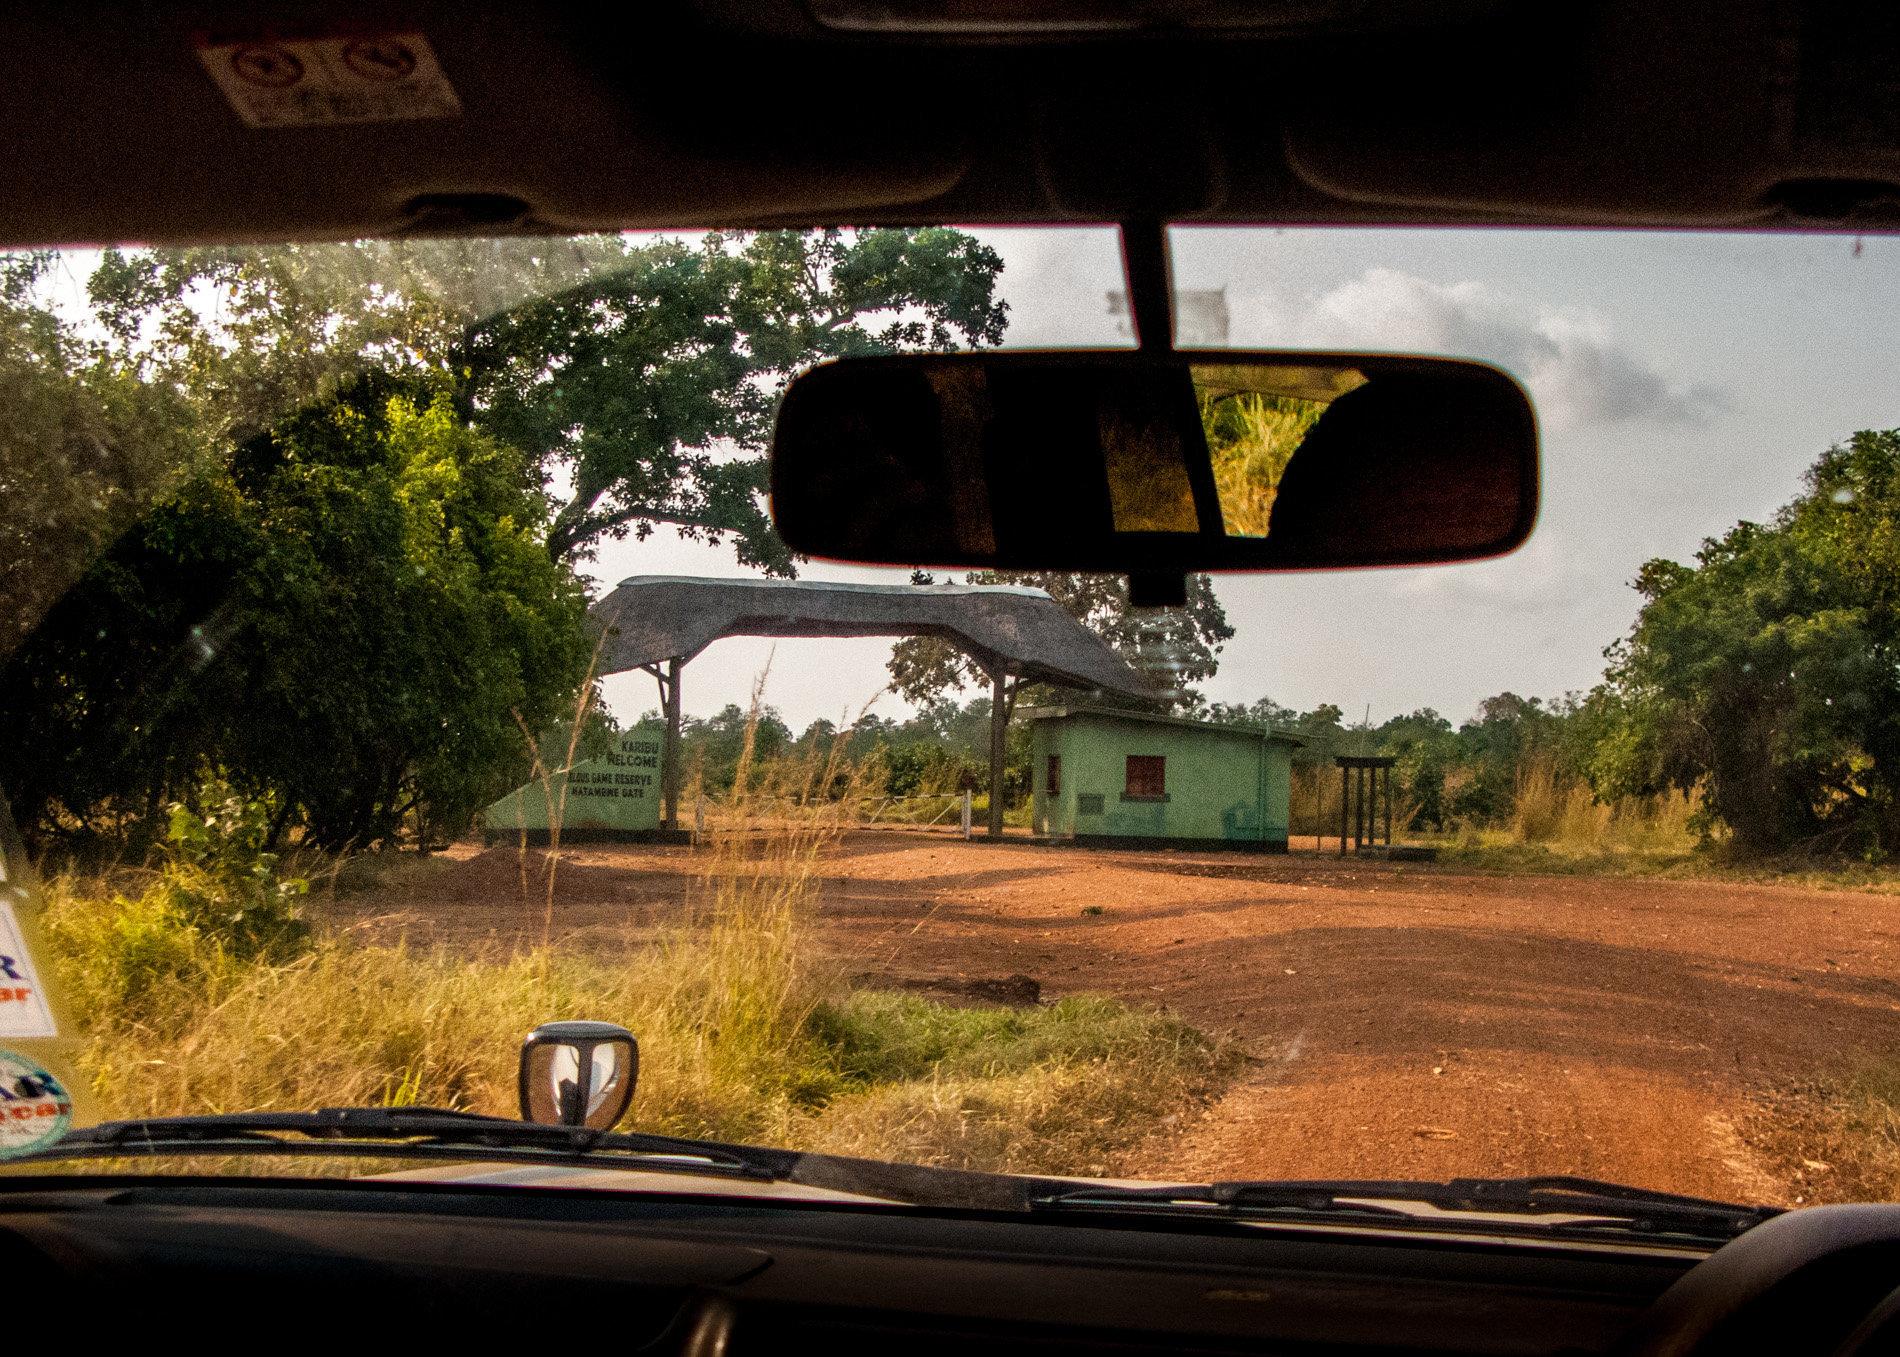 Tanzania,_Back_Seat_View-1839.jpg